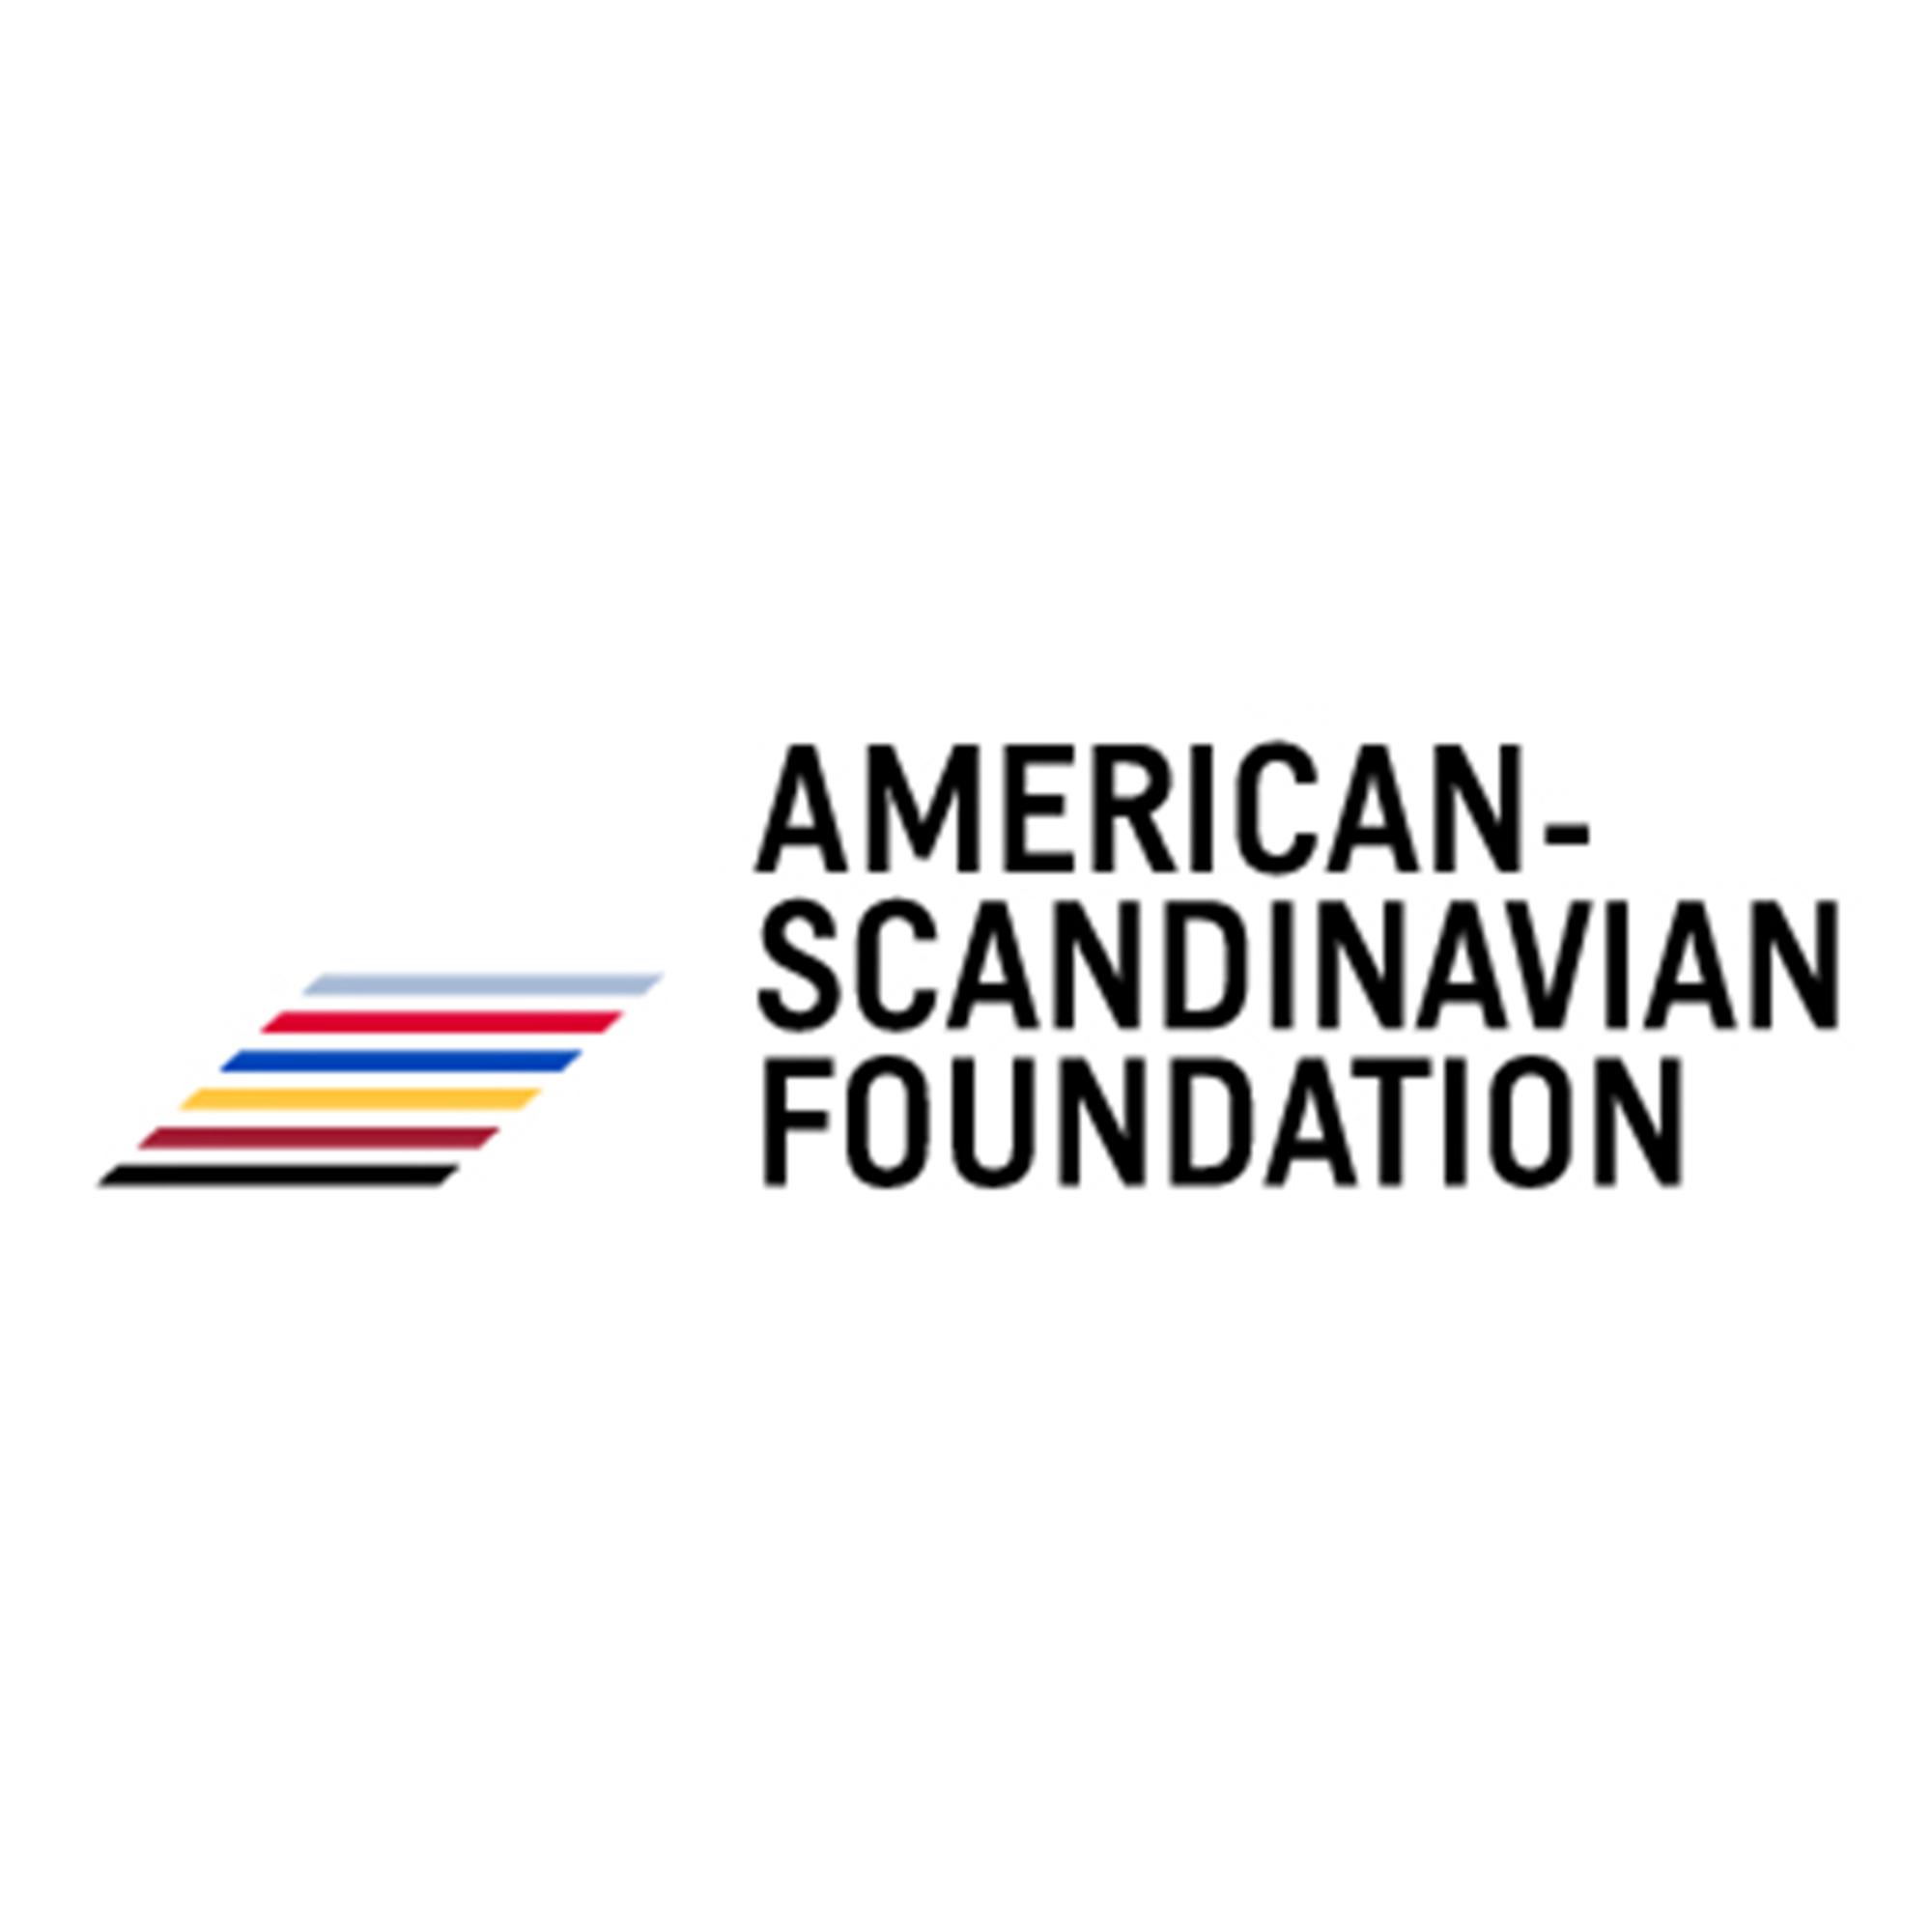 Copy of American Scandinavia Foundation